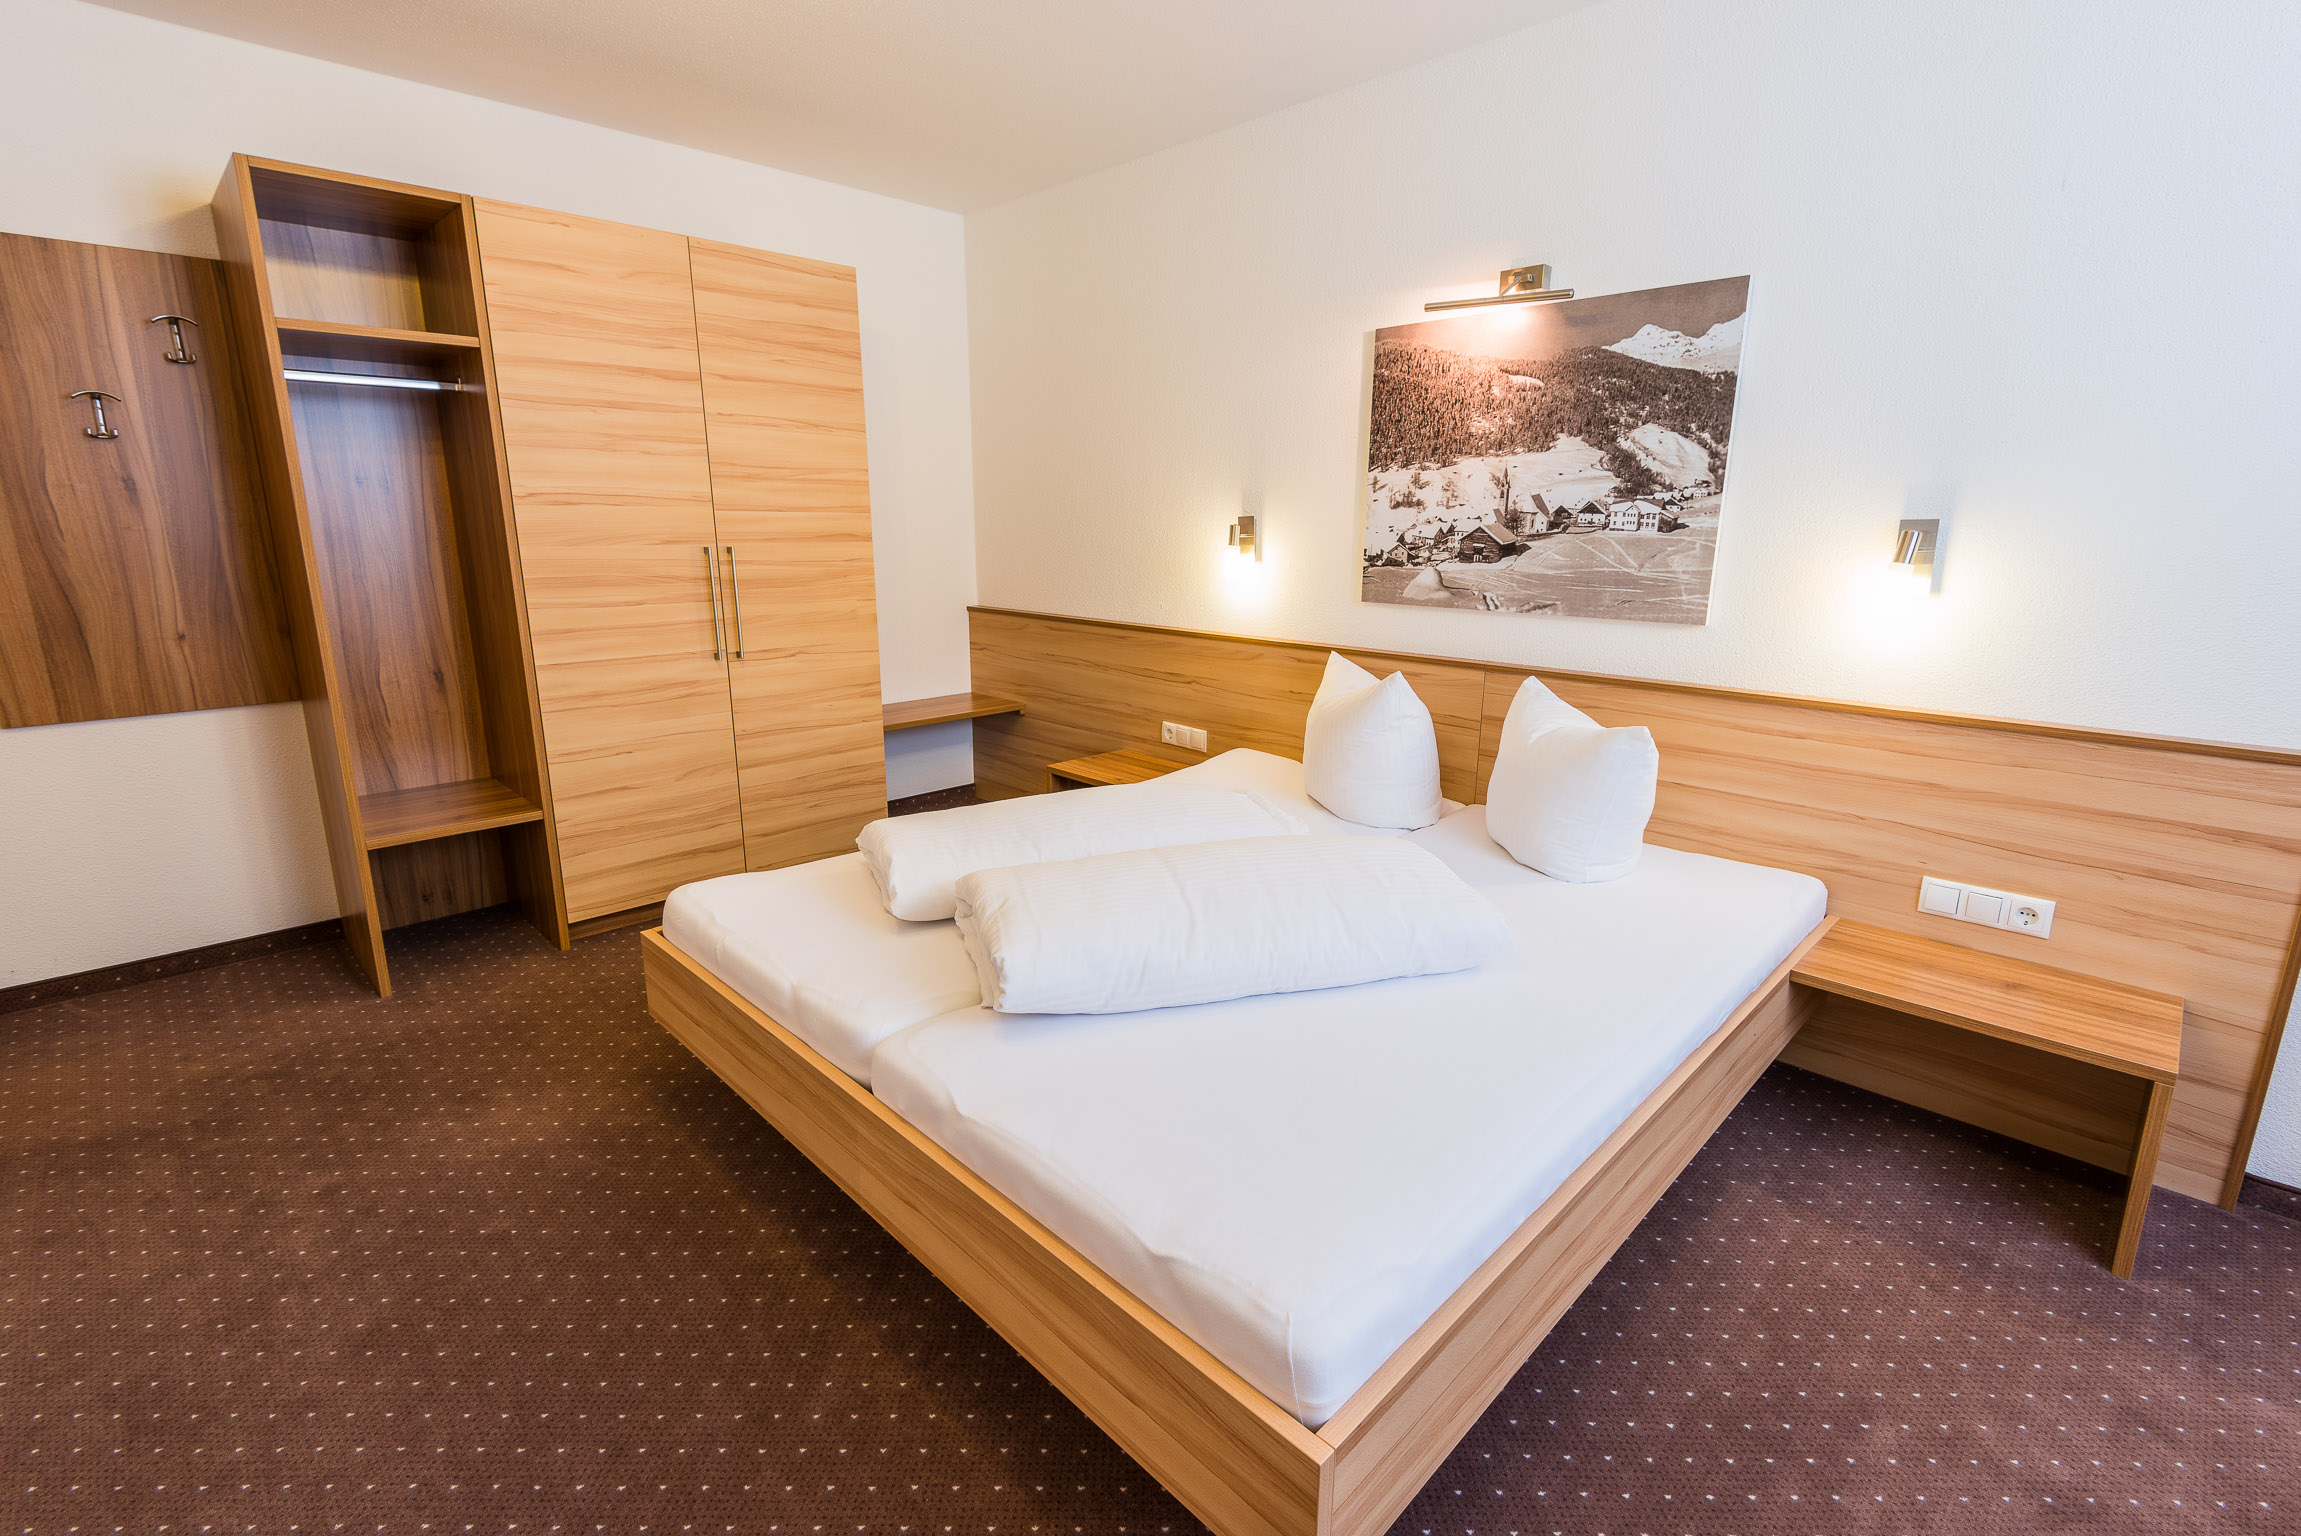 Apartment 1 Doppelbettzimmer